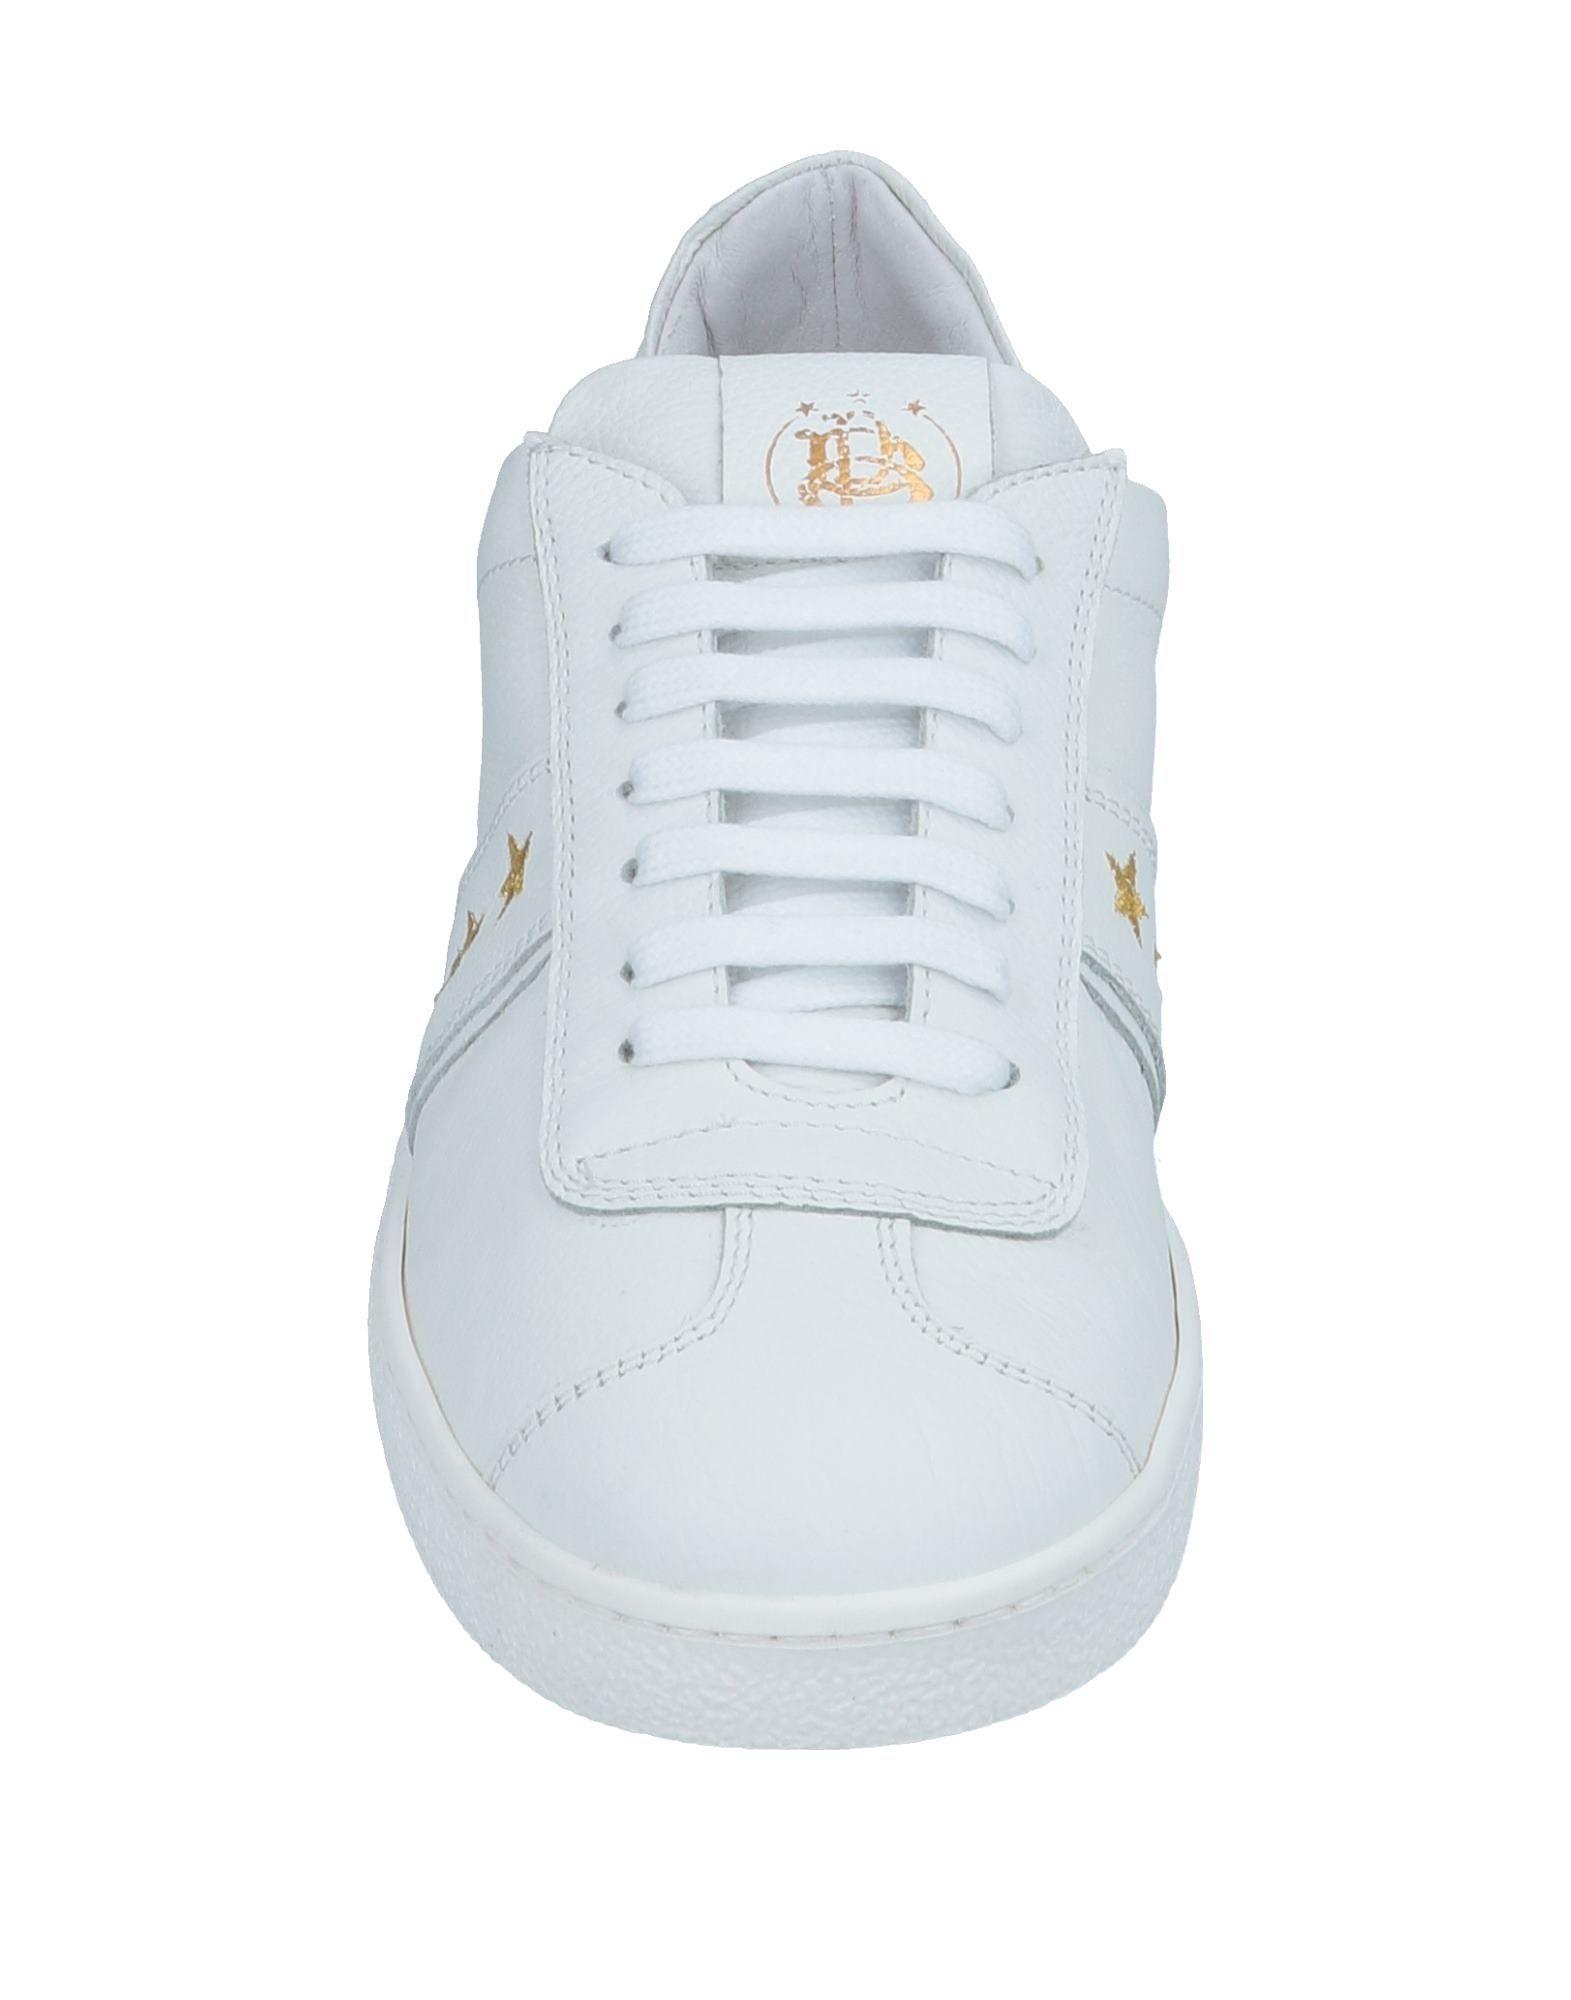 Pantofola Pantofola Pantofola D'oro Sneakers Herren Gutes Preis-Leistungs-Verhältnis, es lohnt sich b8982c